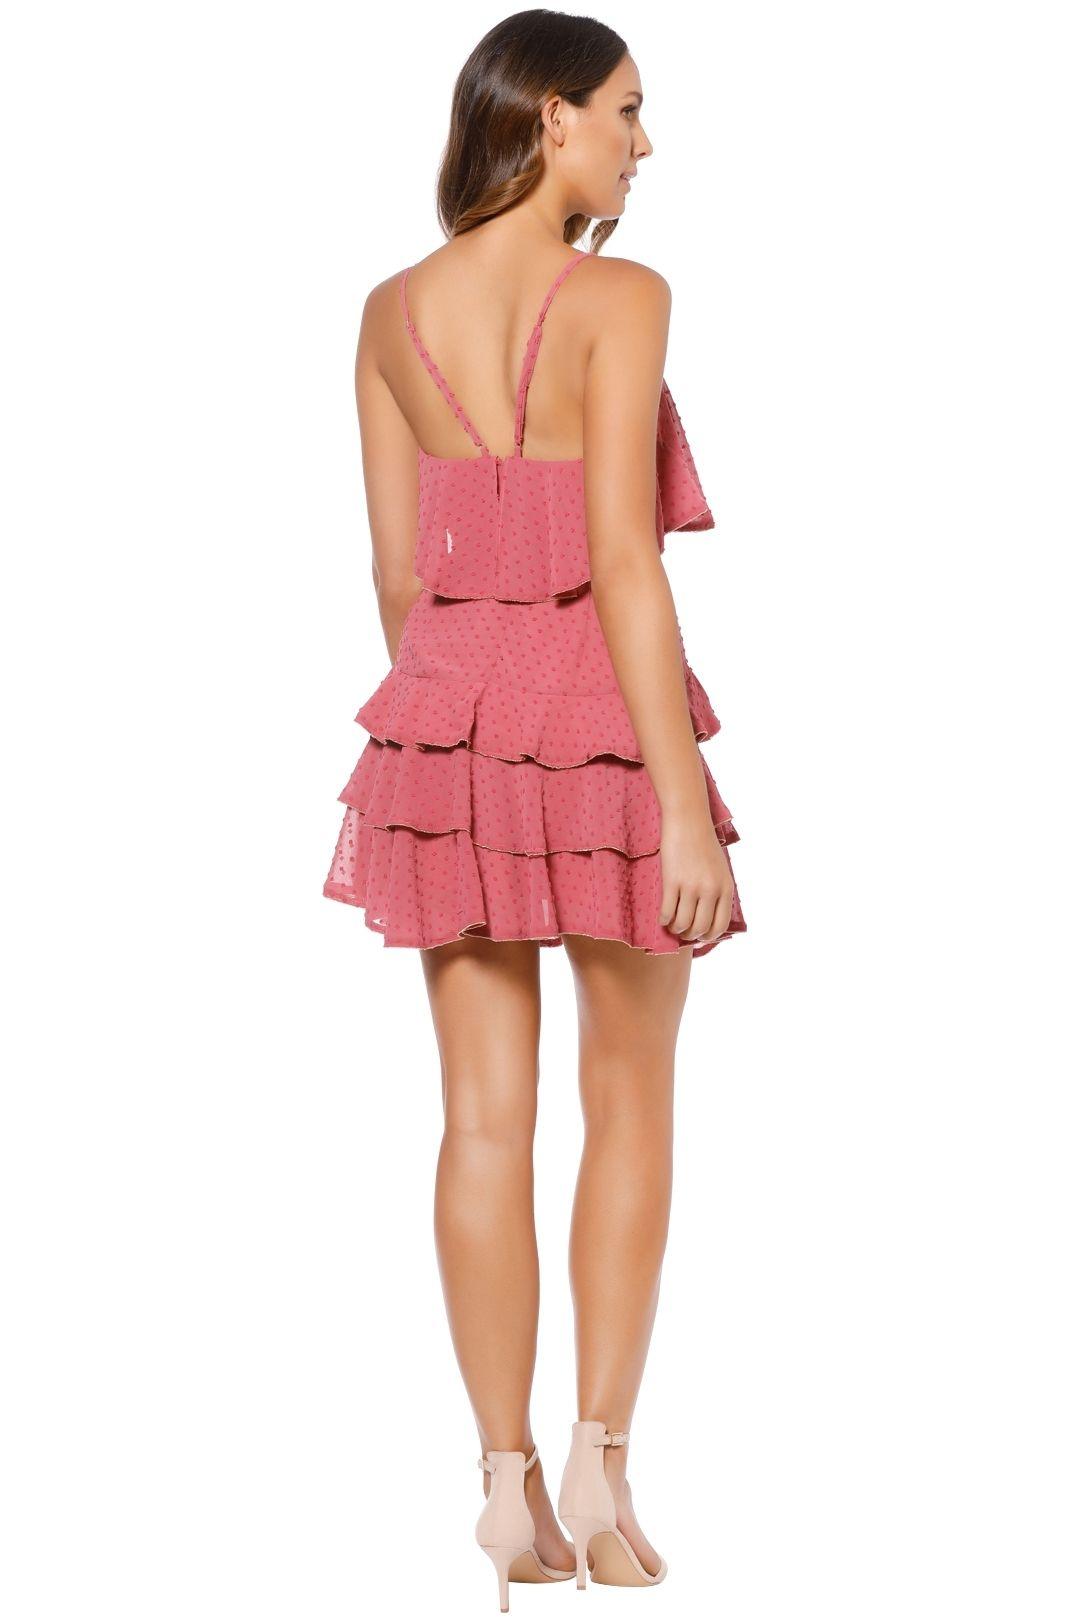 Talulah - Soft Posey Mini Dress - Pink - Back